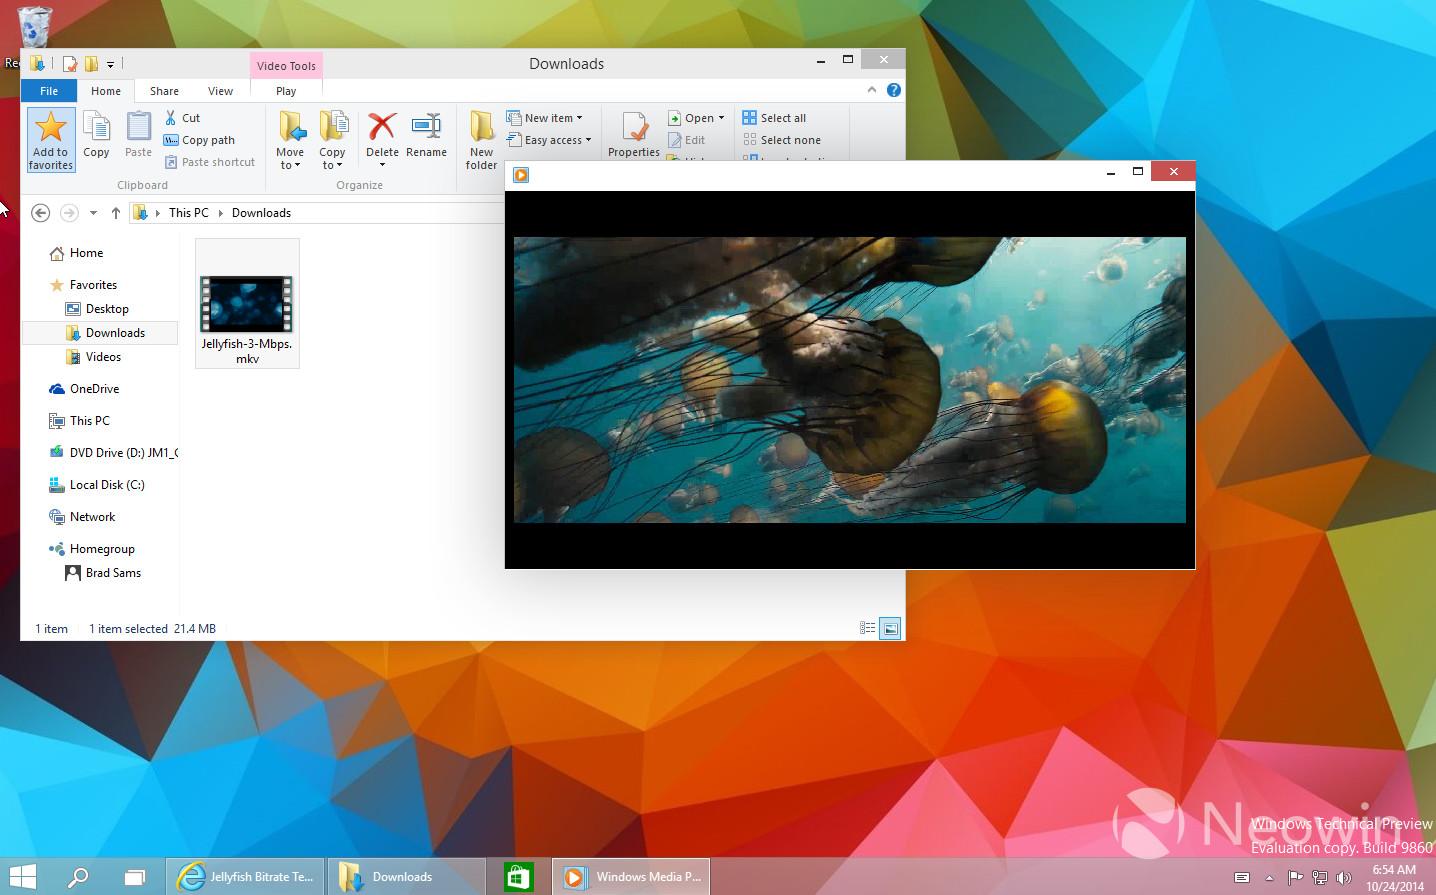 Windows 10 MKV Support